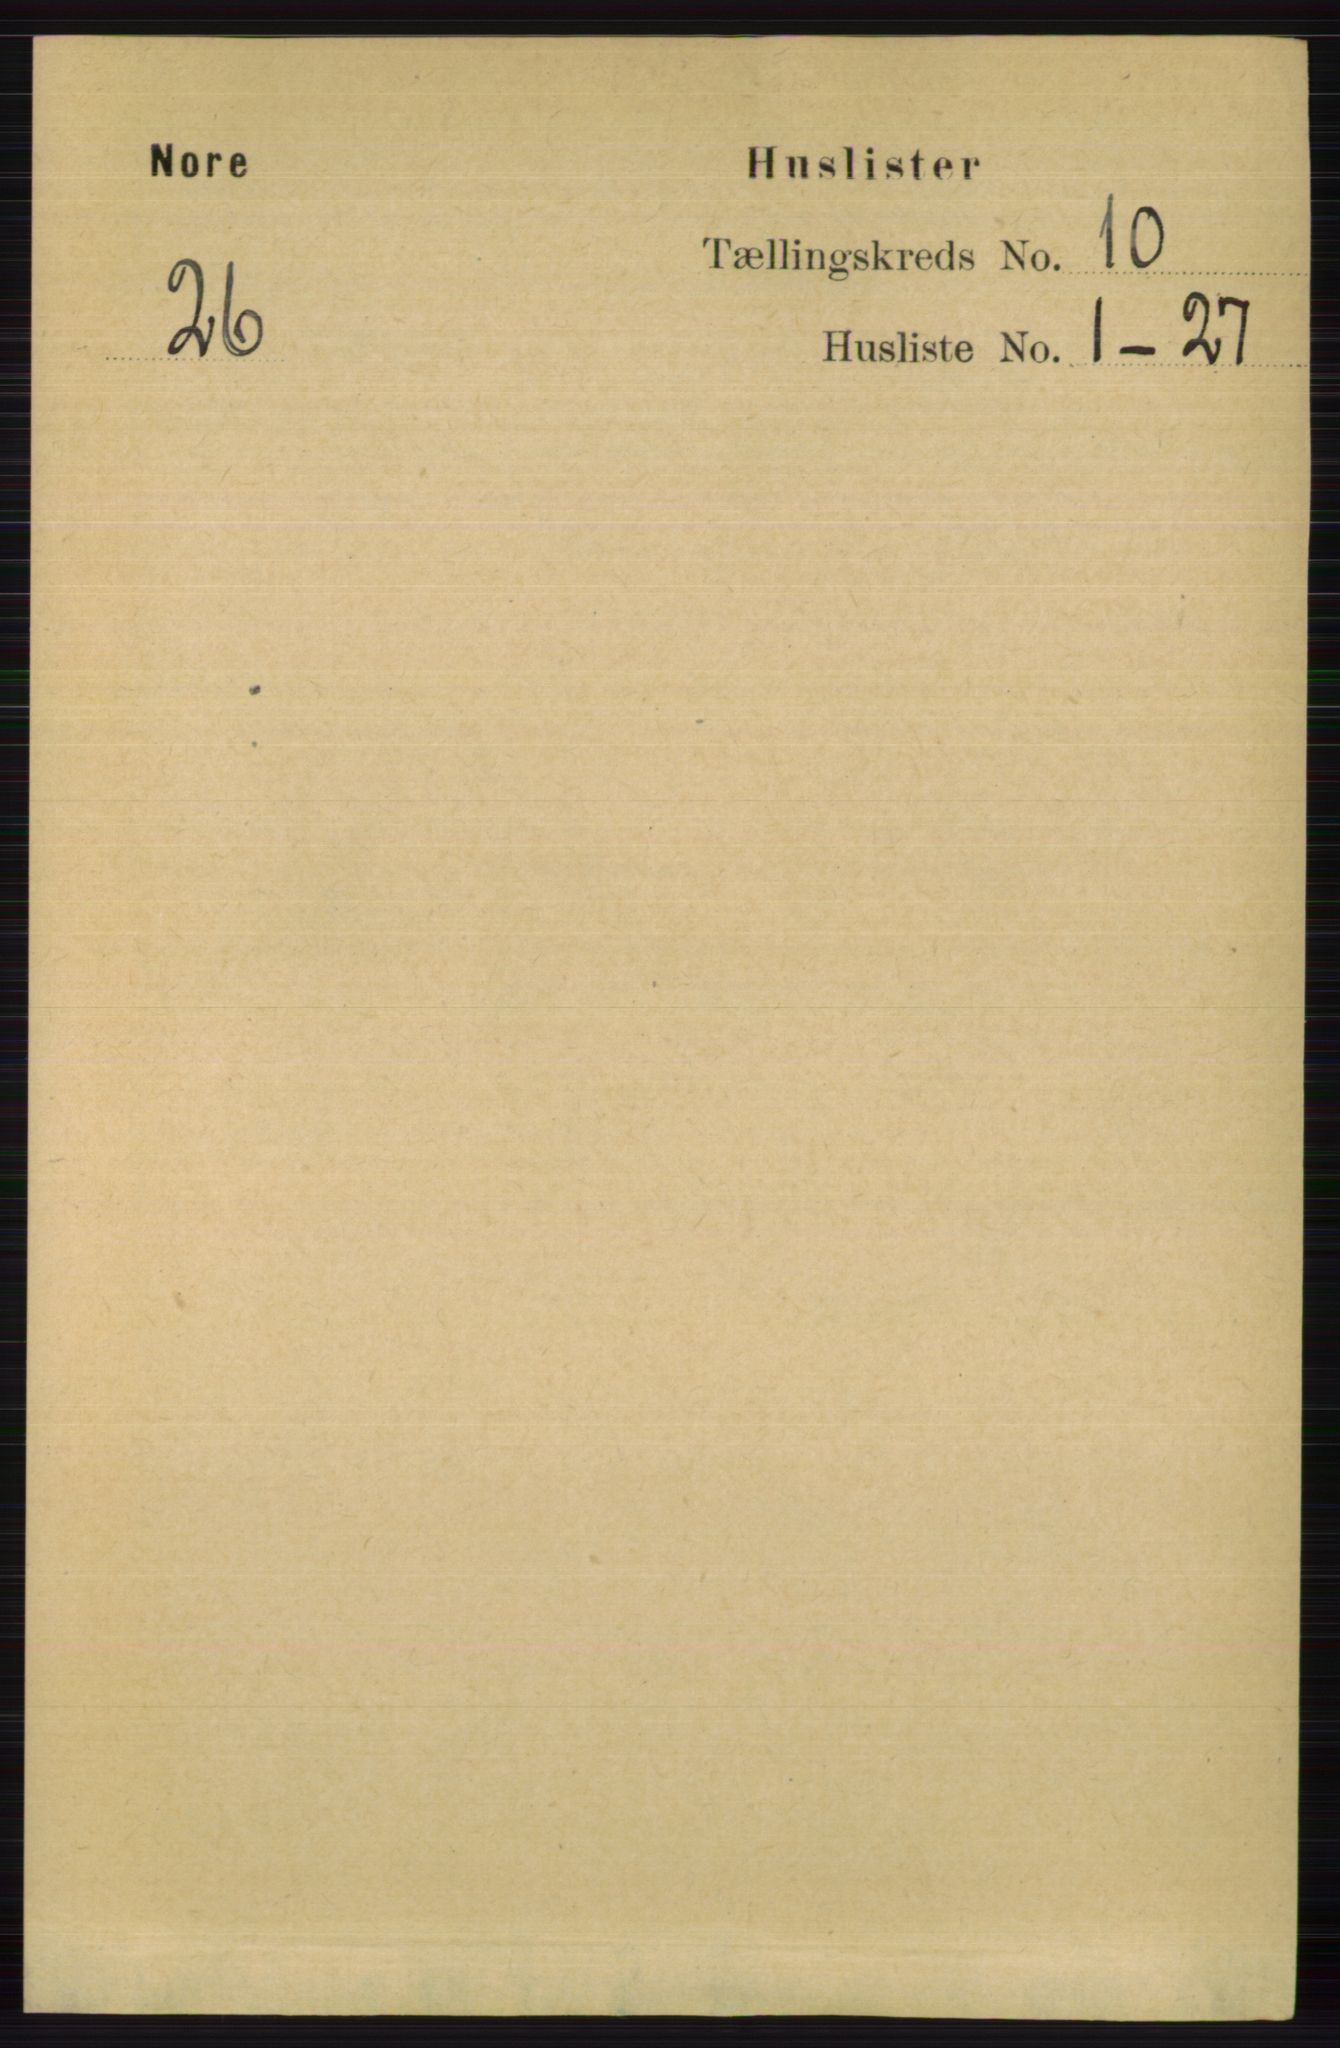 RA, Folketelling 1891 for 0633 Nore herred, 1891, s. 3514